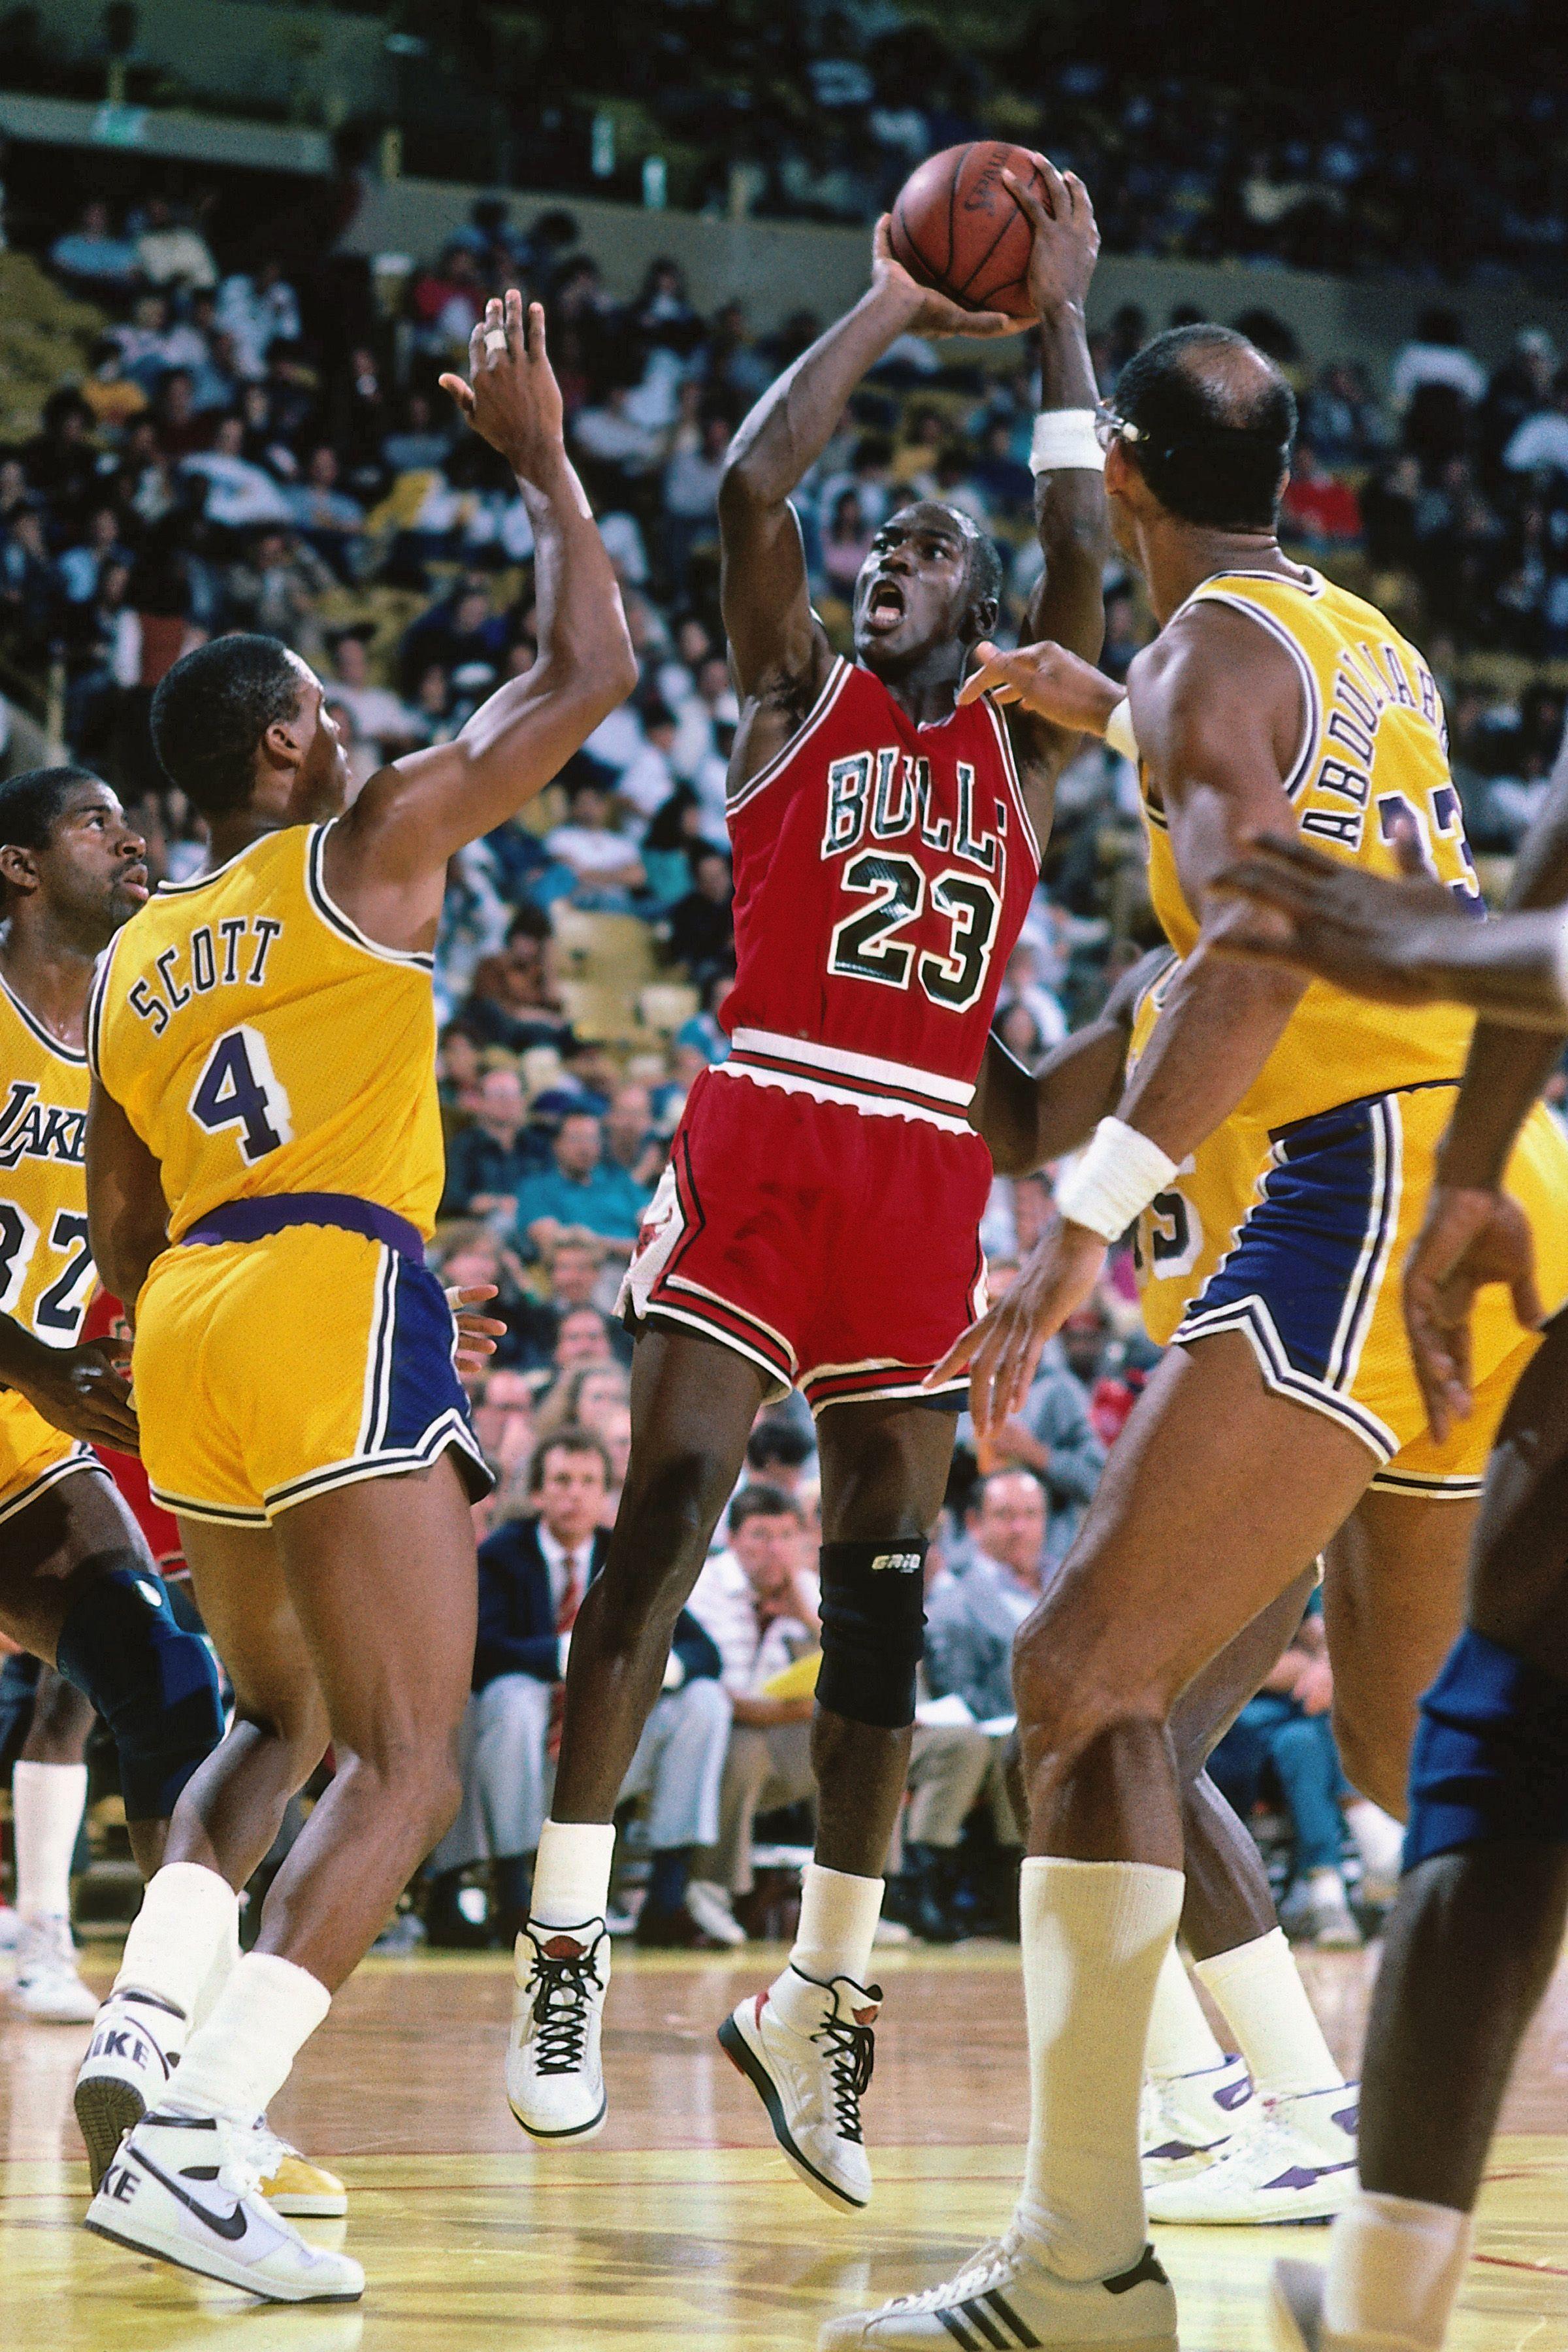 The Best All Nba 1st Teams From A Sneaker Standpoint Nice Kicks Michael Jordan Michael Jordan Basketball Chicago Bulls